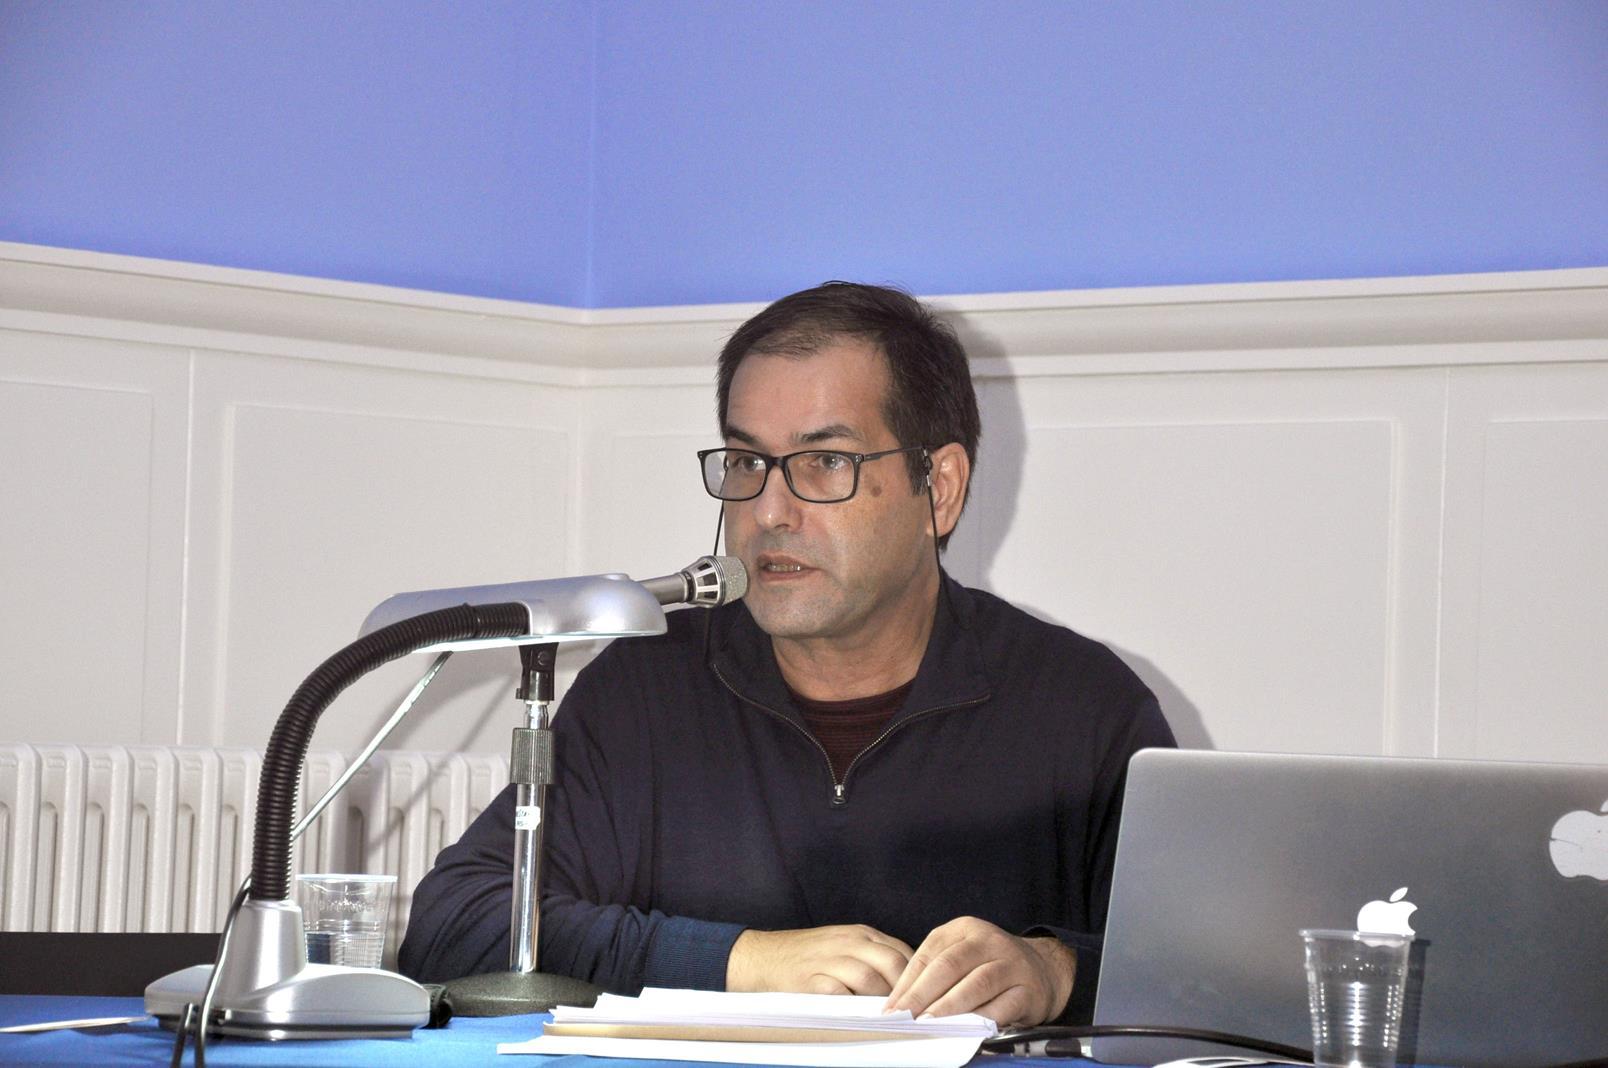 Nuno Borges d'Araújo. Arquitecto, Braga, Portugal. 23/10/19